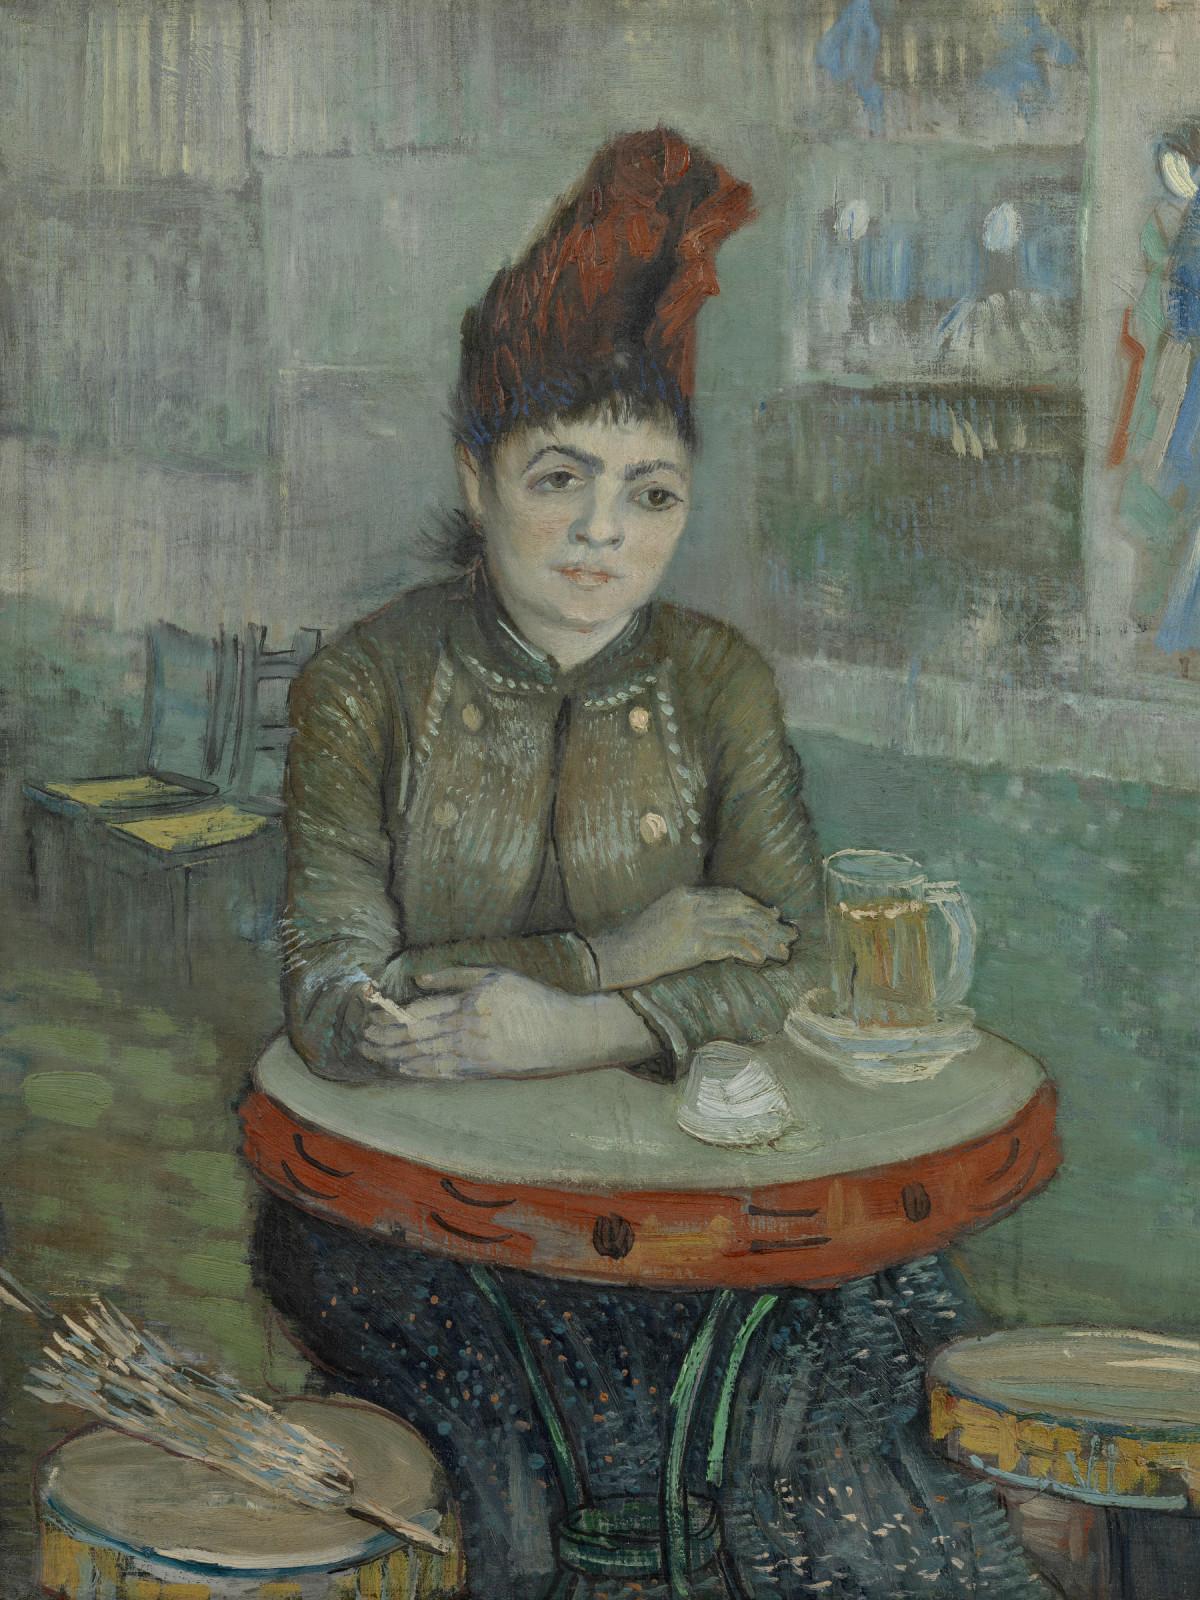 Vincent Van Gogh S Rare Art Comes To Texas In Blockbuster